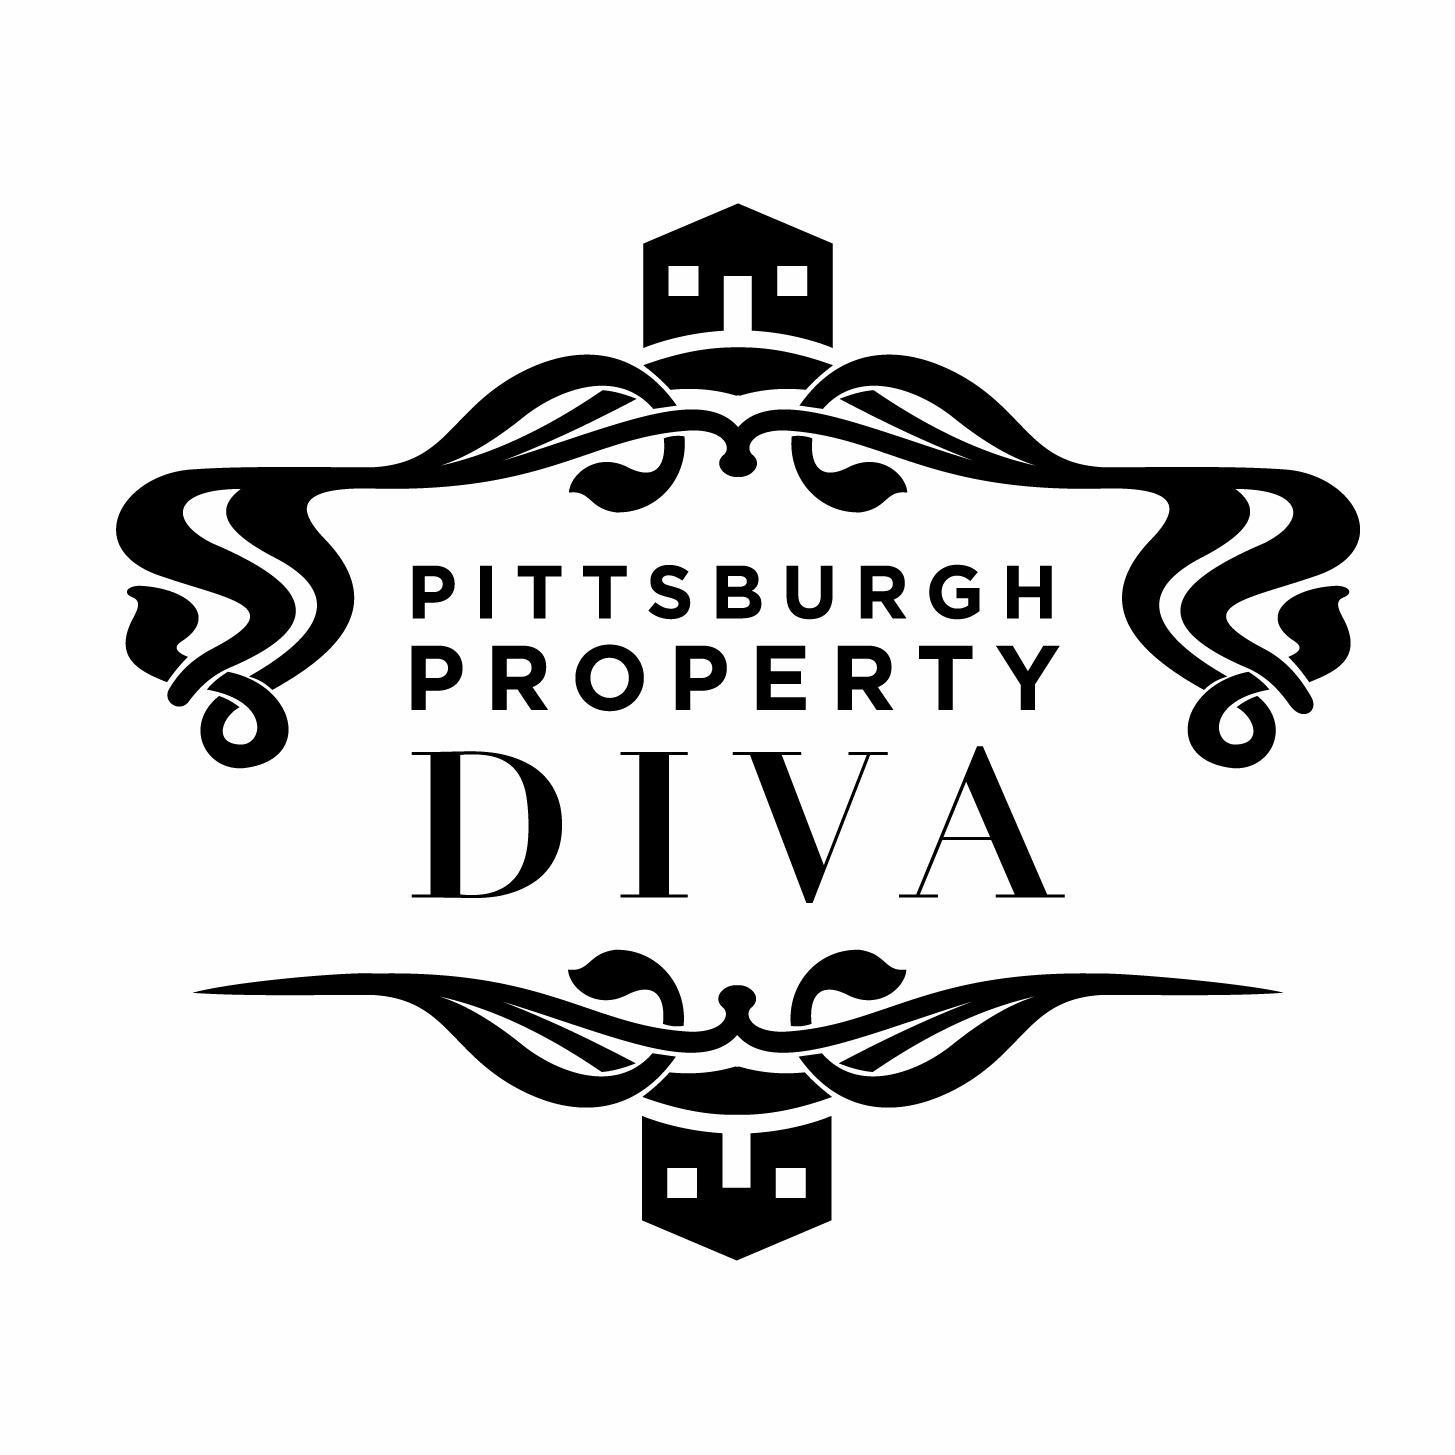 Pittsburgh Property Diva